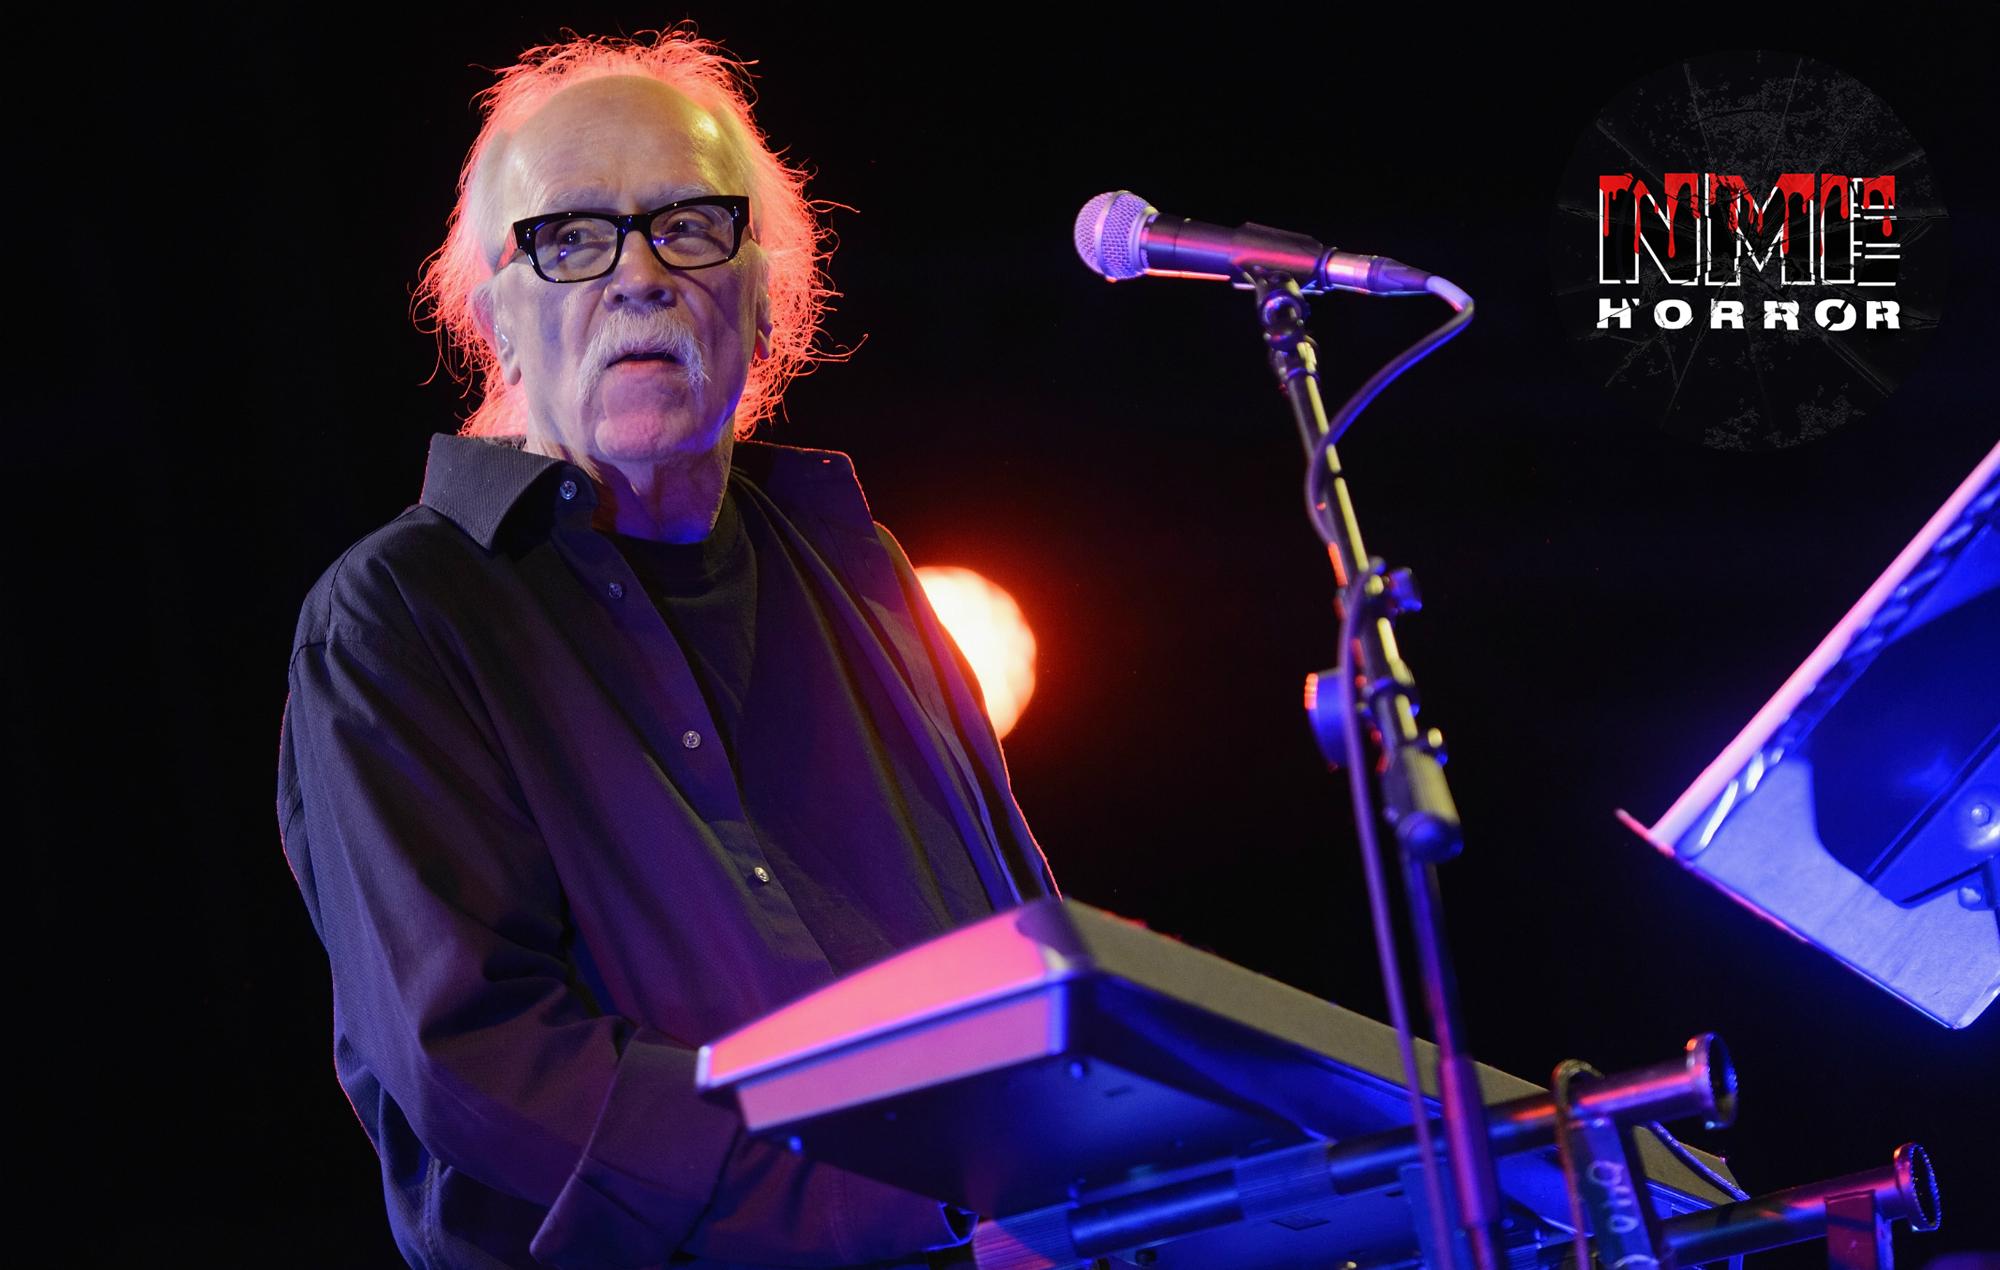 Halloween 2020 John Carpenter Music John Carpenter to release unreleased music from 'The Thing'